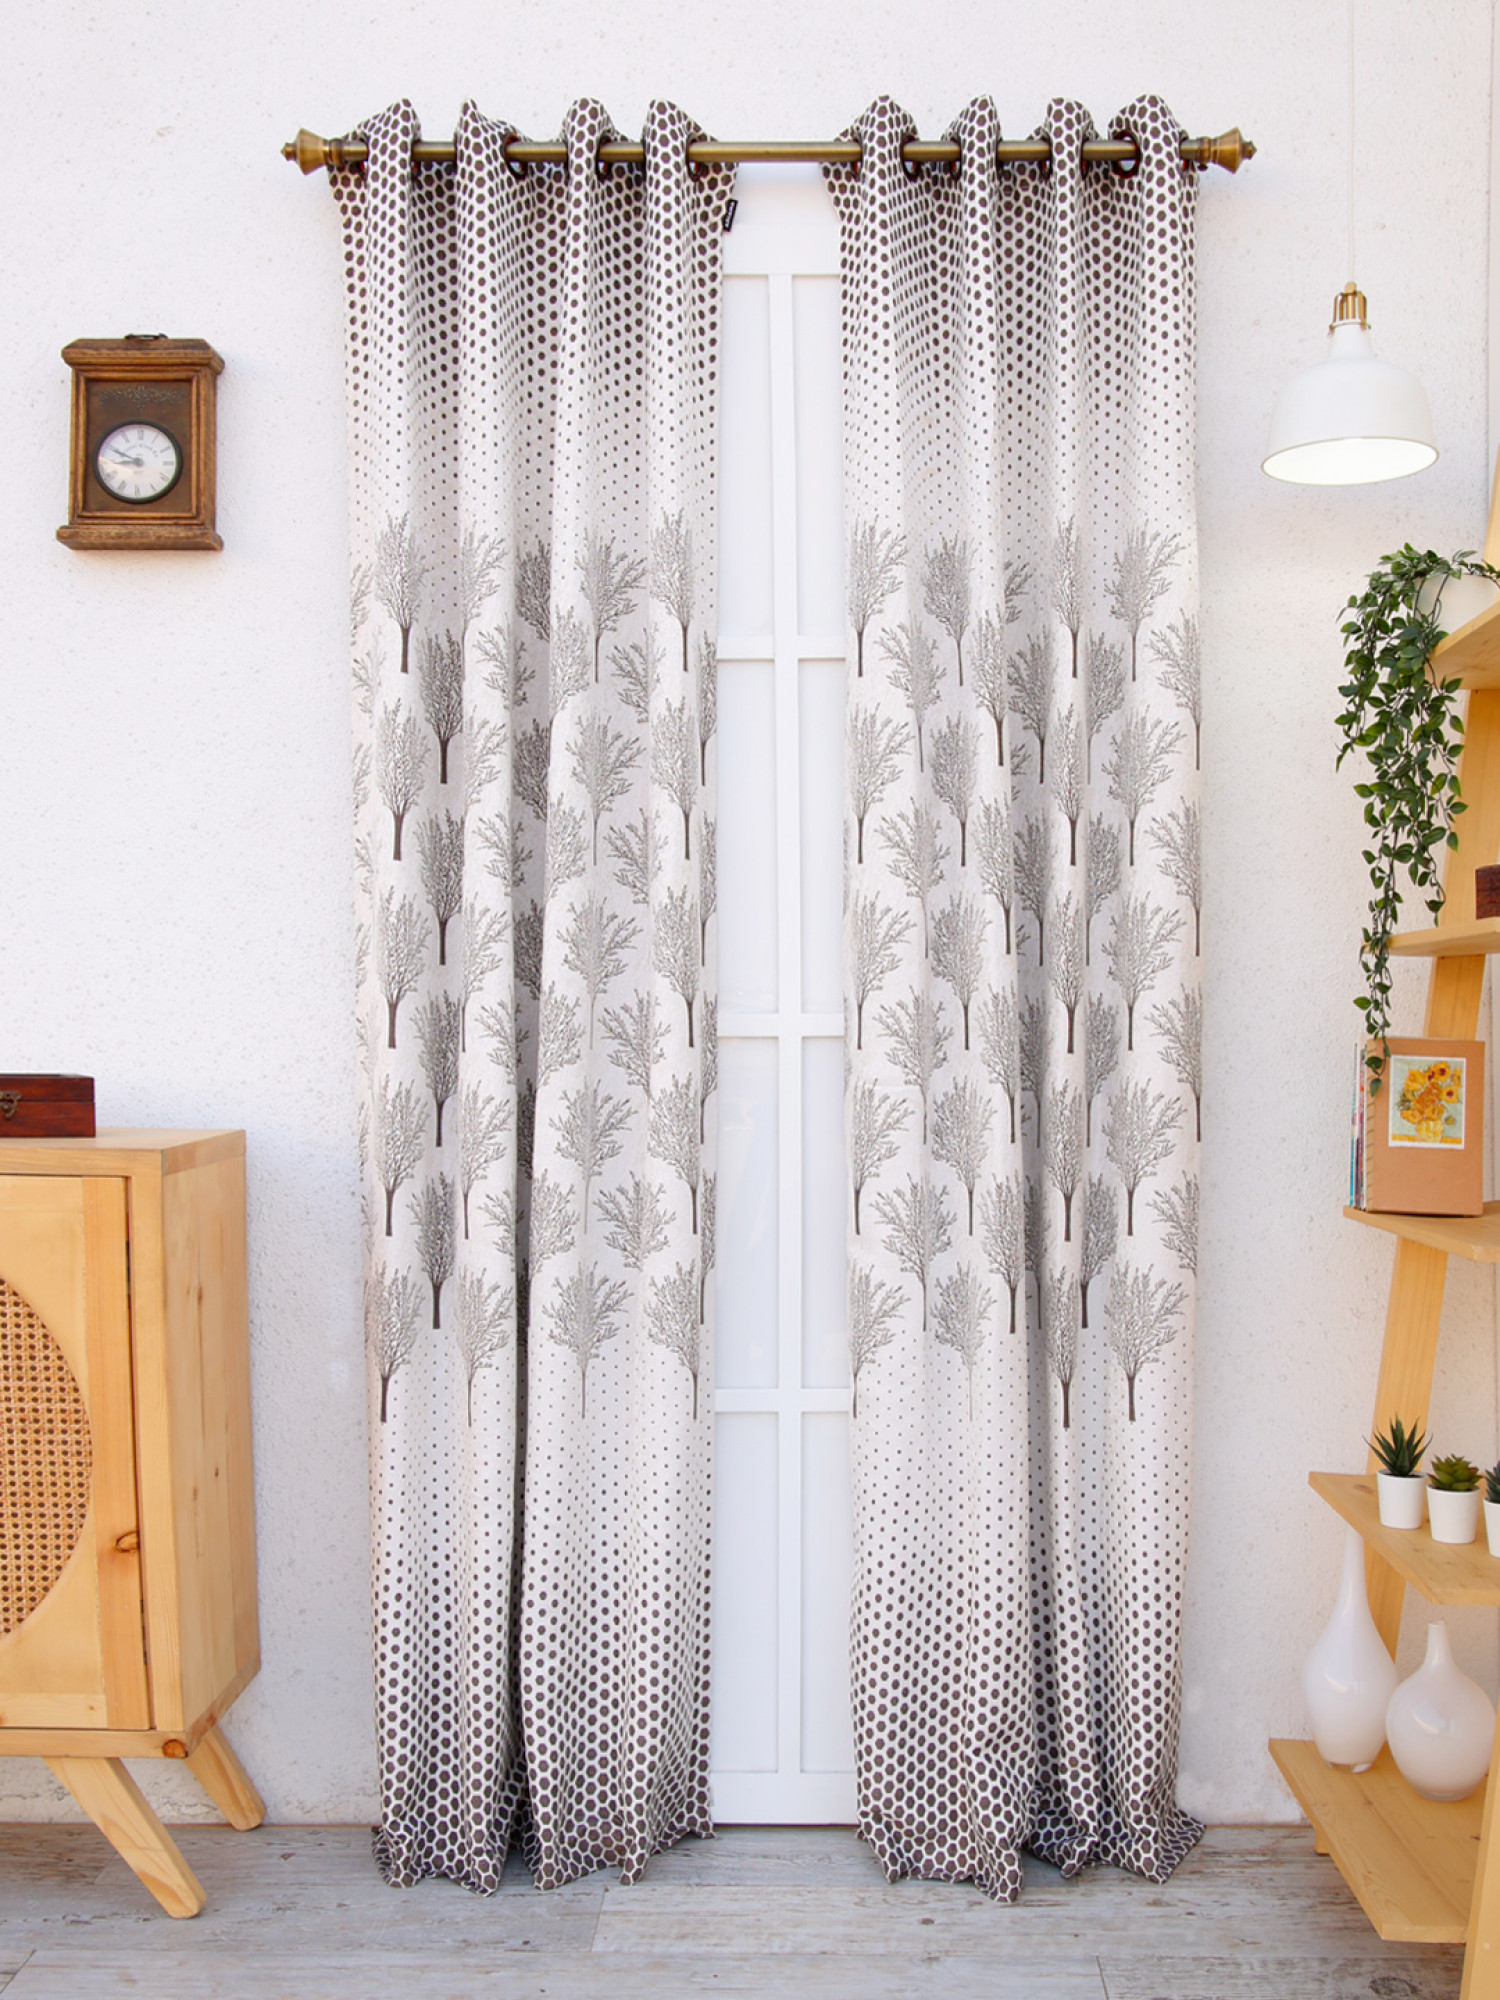 Valerian Curtain